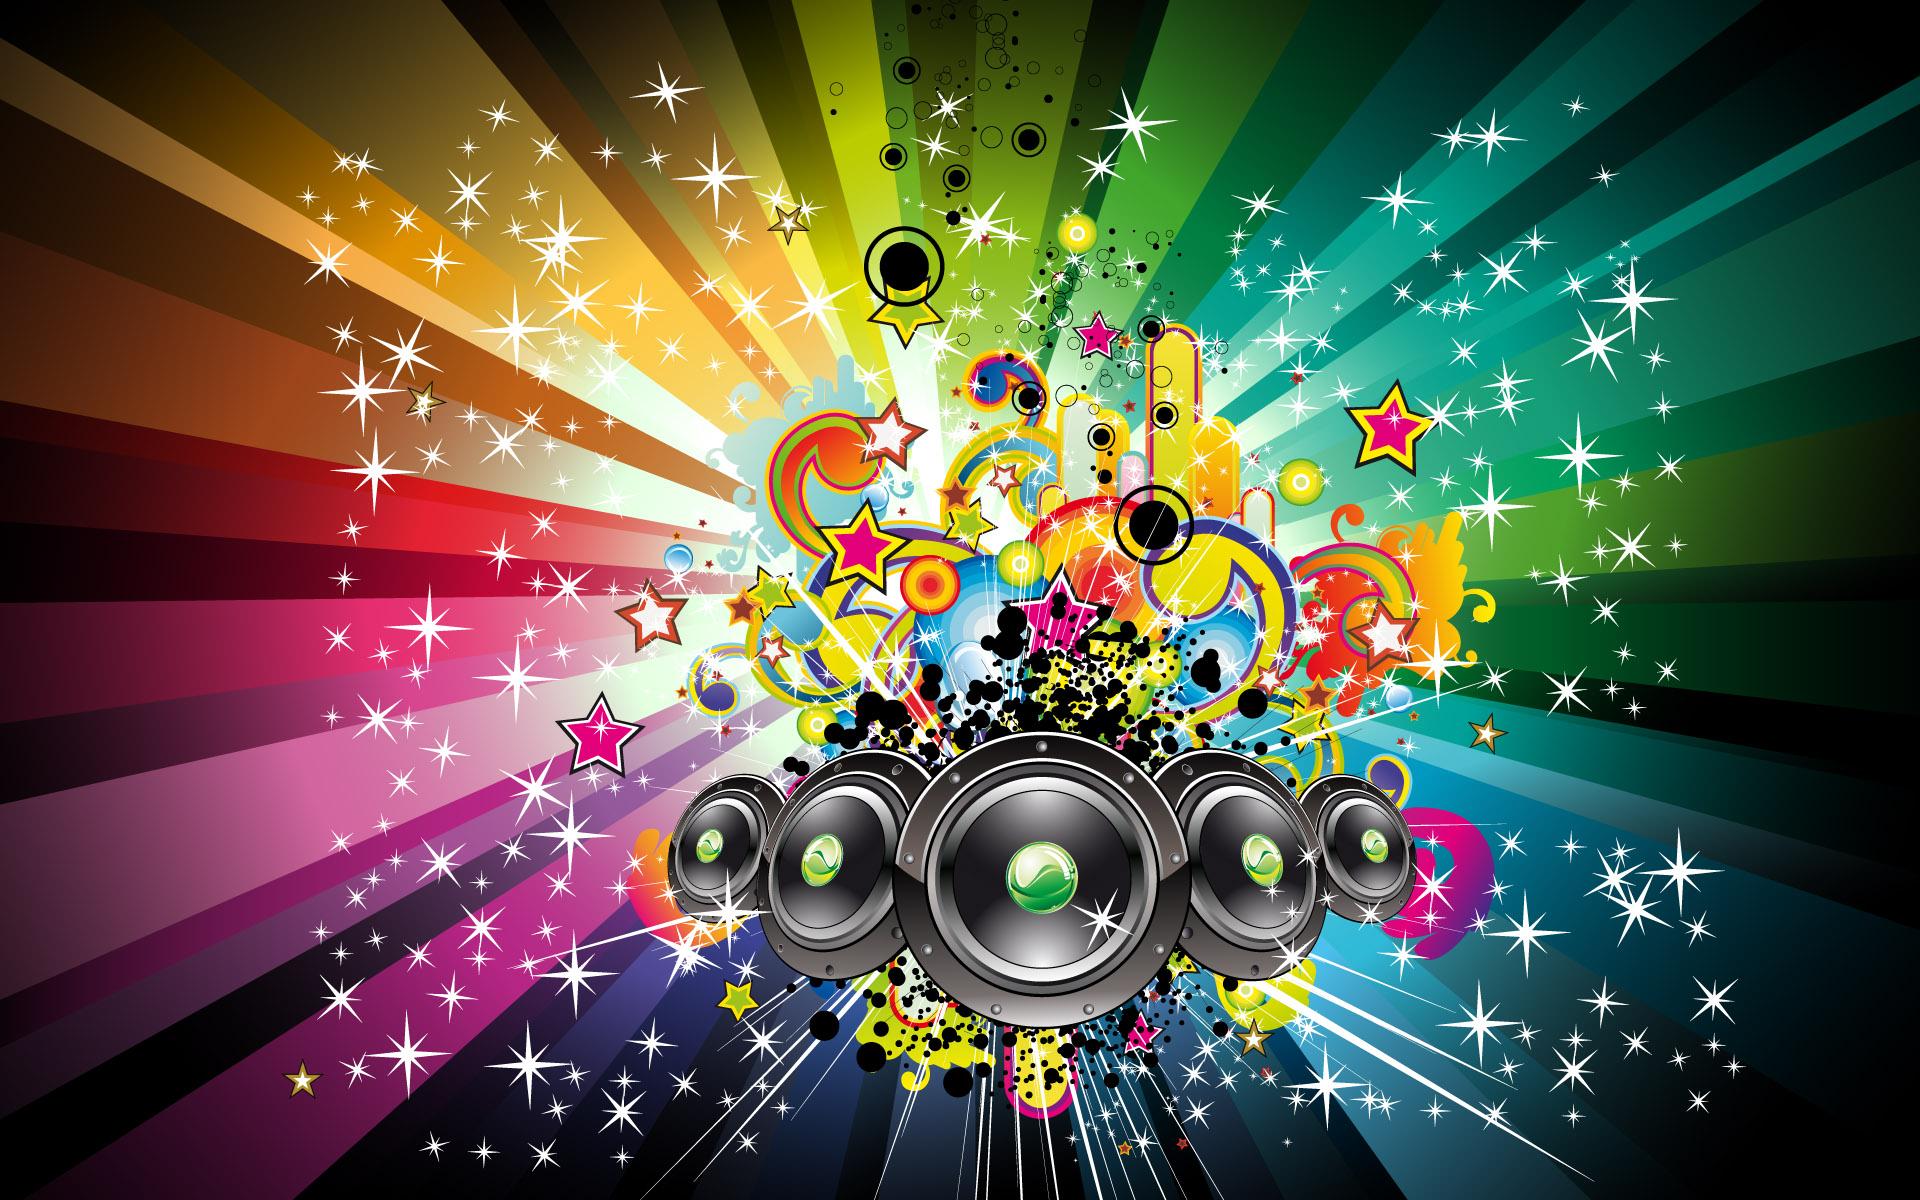 music wallpaper,graphic design,fractal art,design,art,graphics